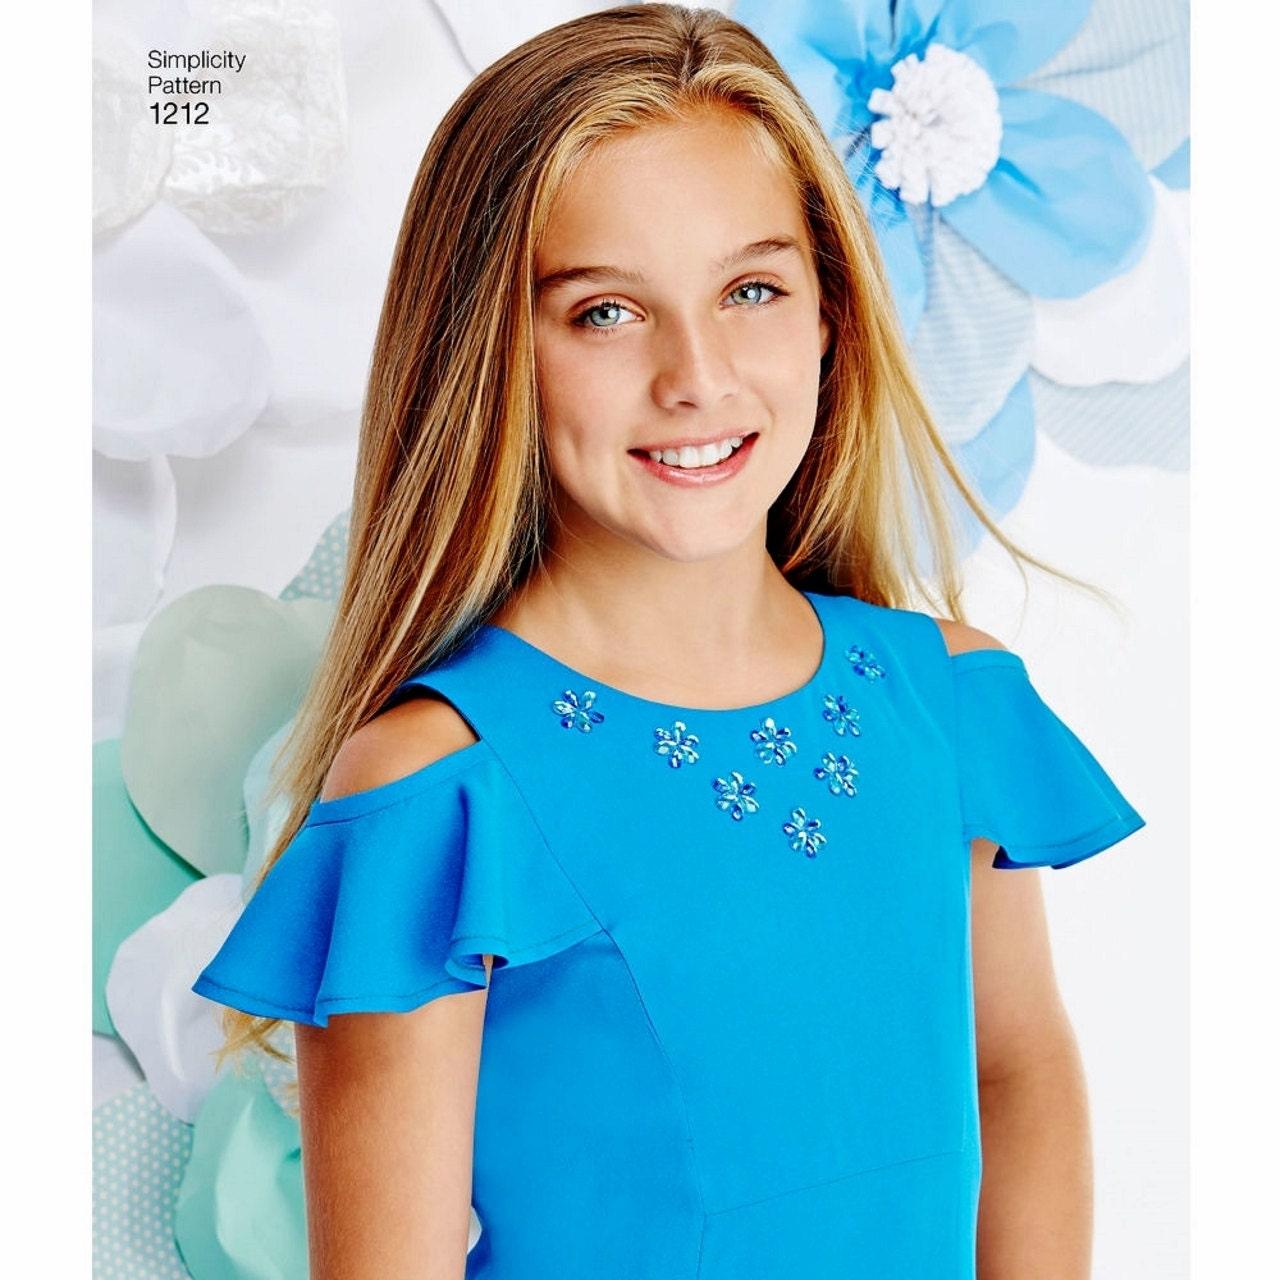 Tween Girls\' Dress Pattern, Tween Girls\' Formal Dress Pattern, Tween ...